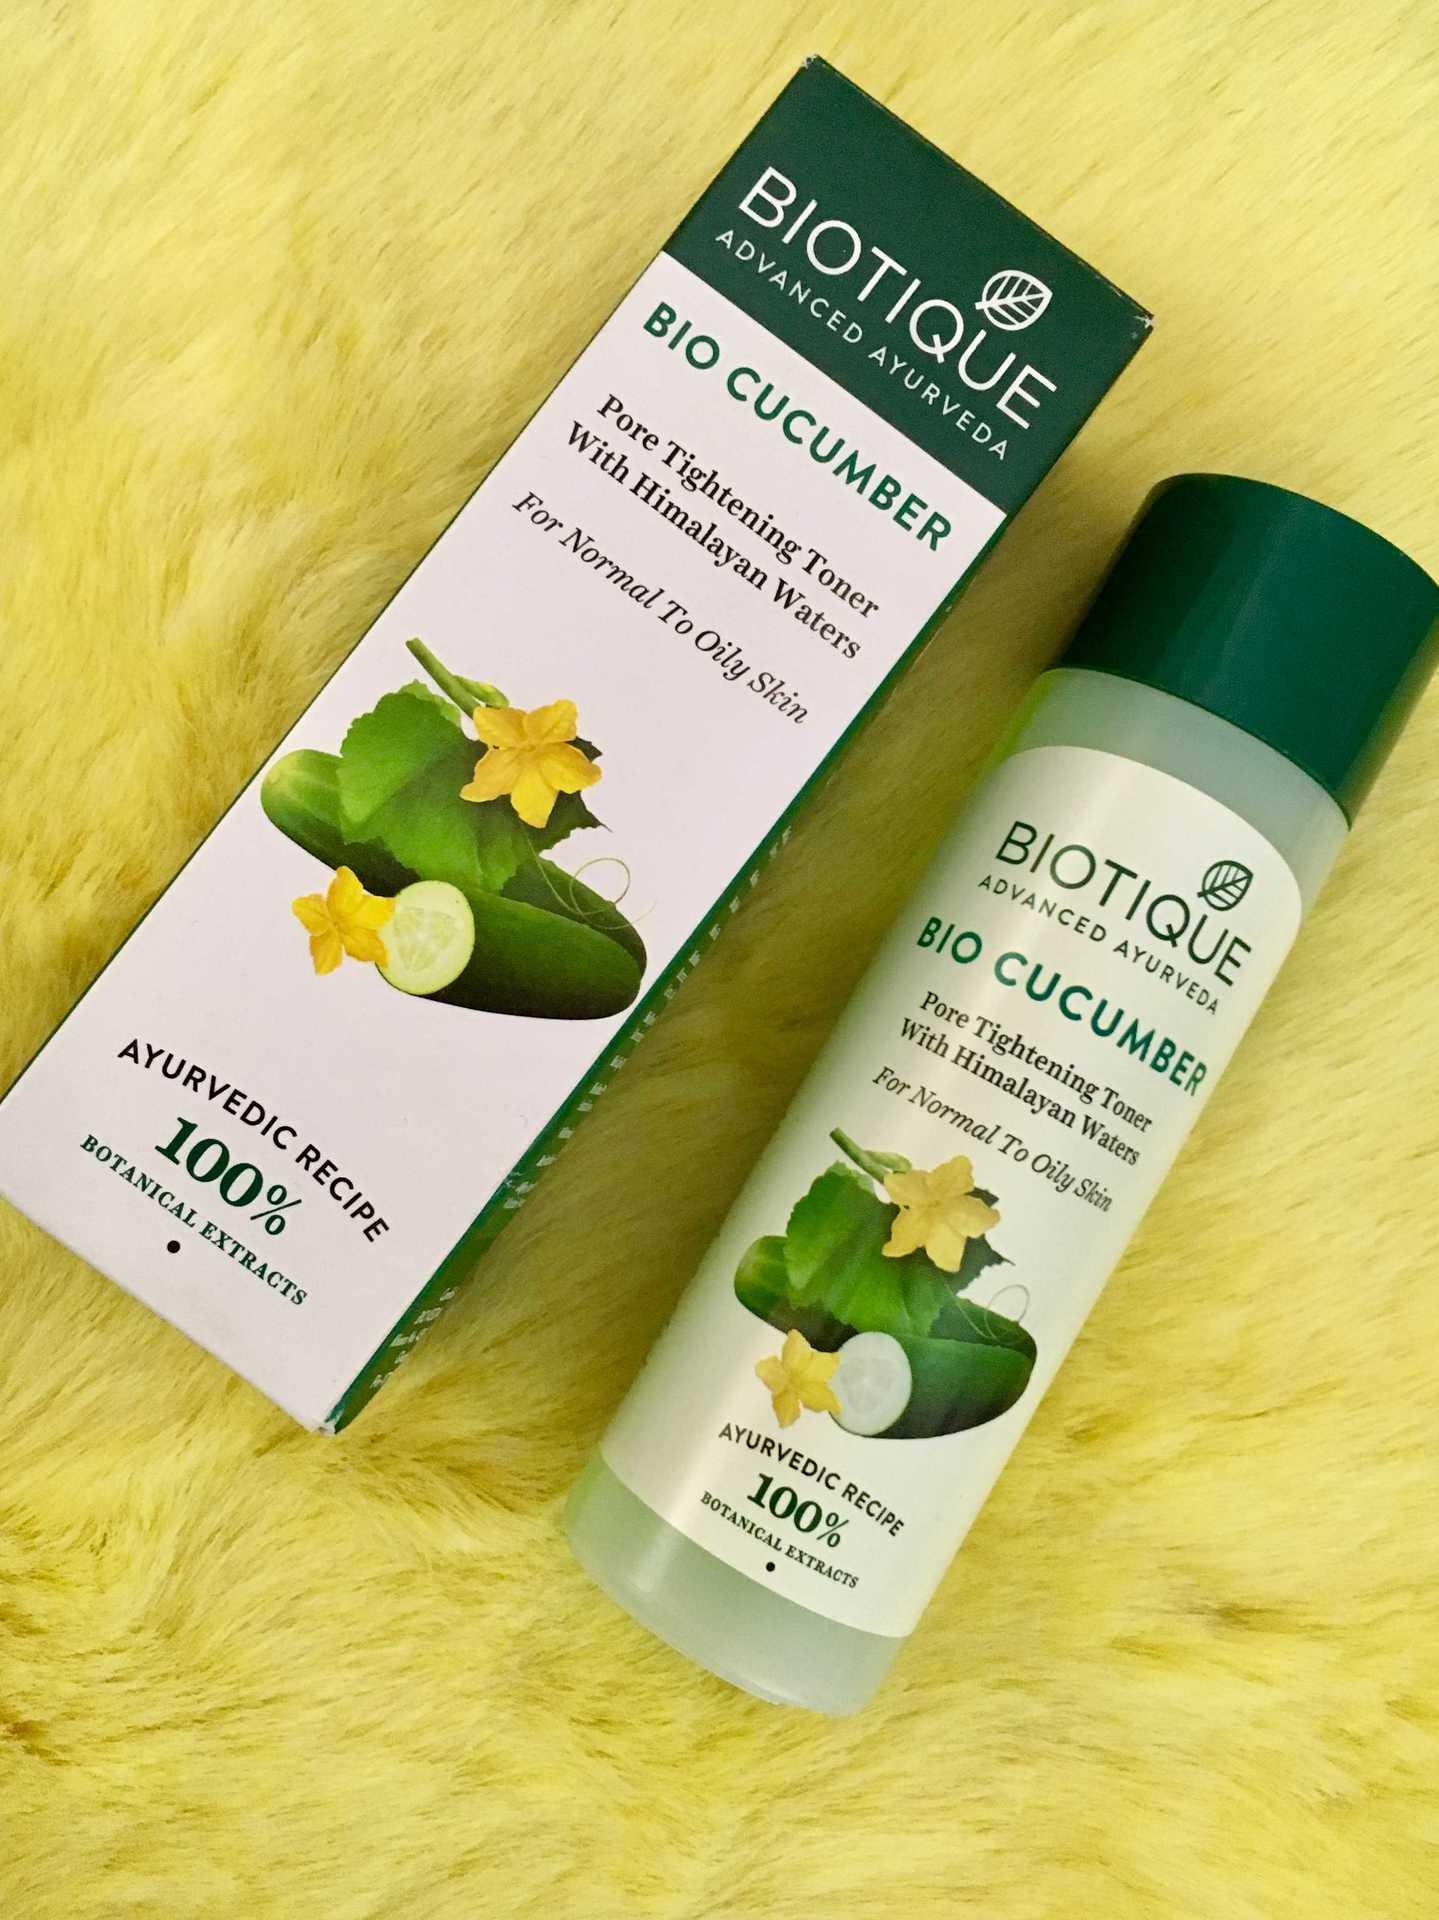 Biotique Bio Cucumber Pore Tightening Toner with Himalaya Waters Review image